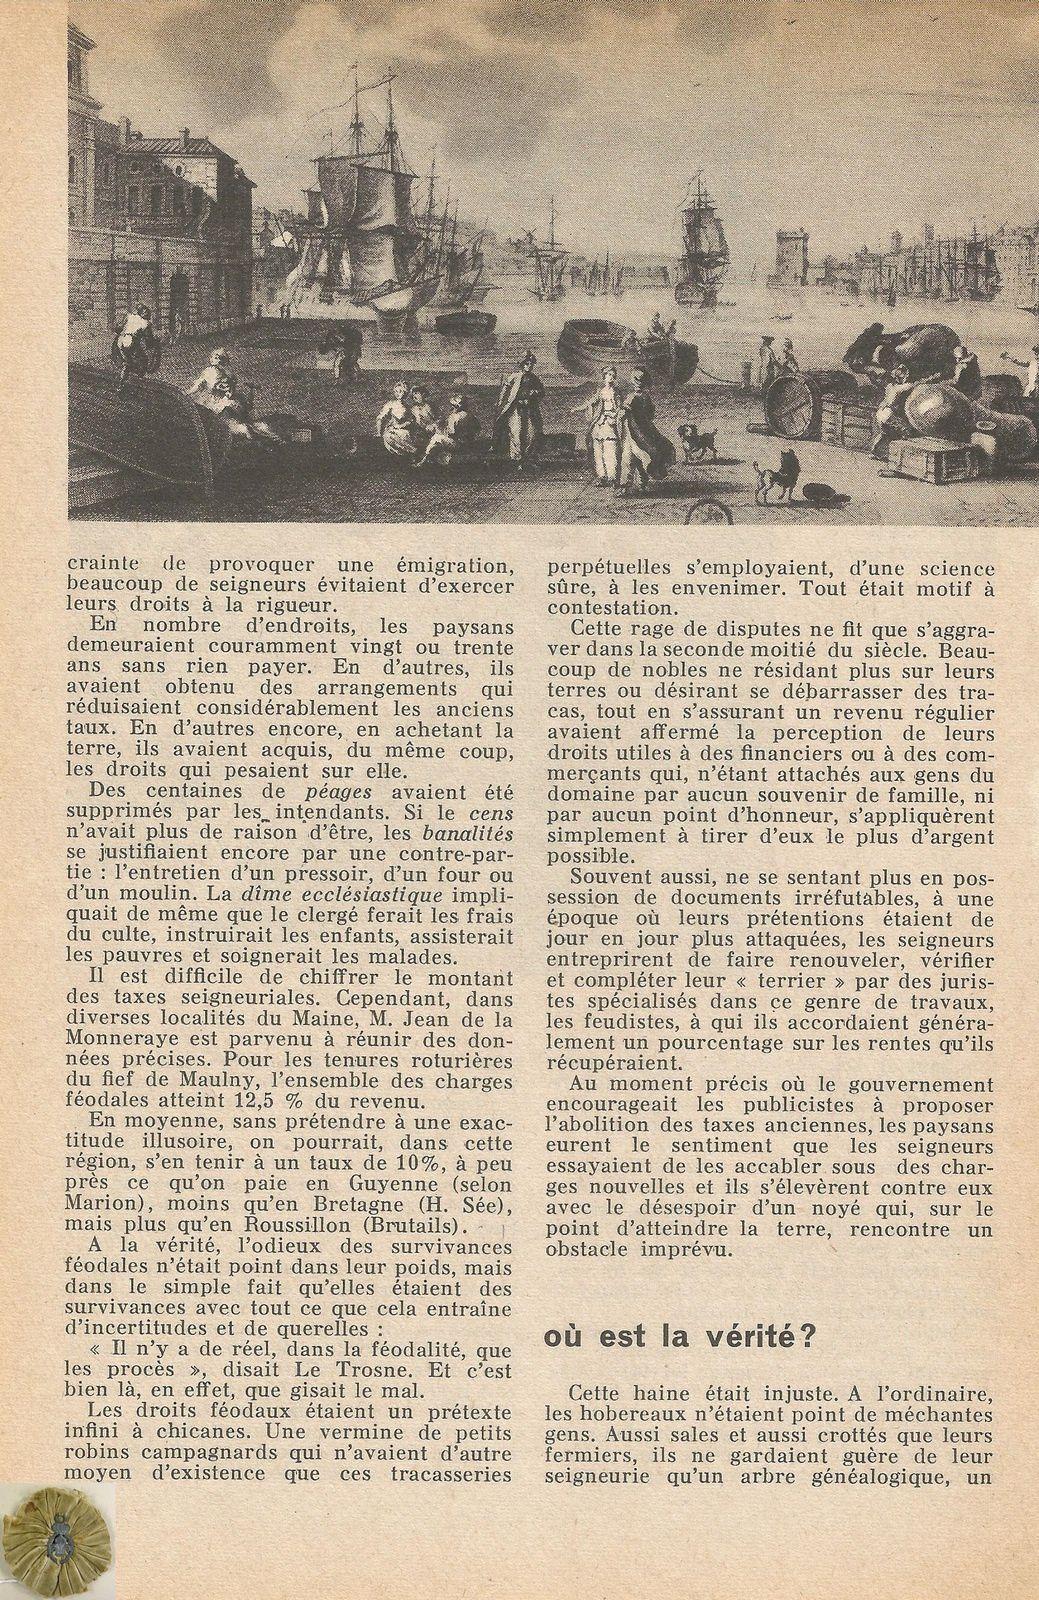 HISTORIA NUMÉRO 197 - AVRIL 1963